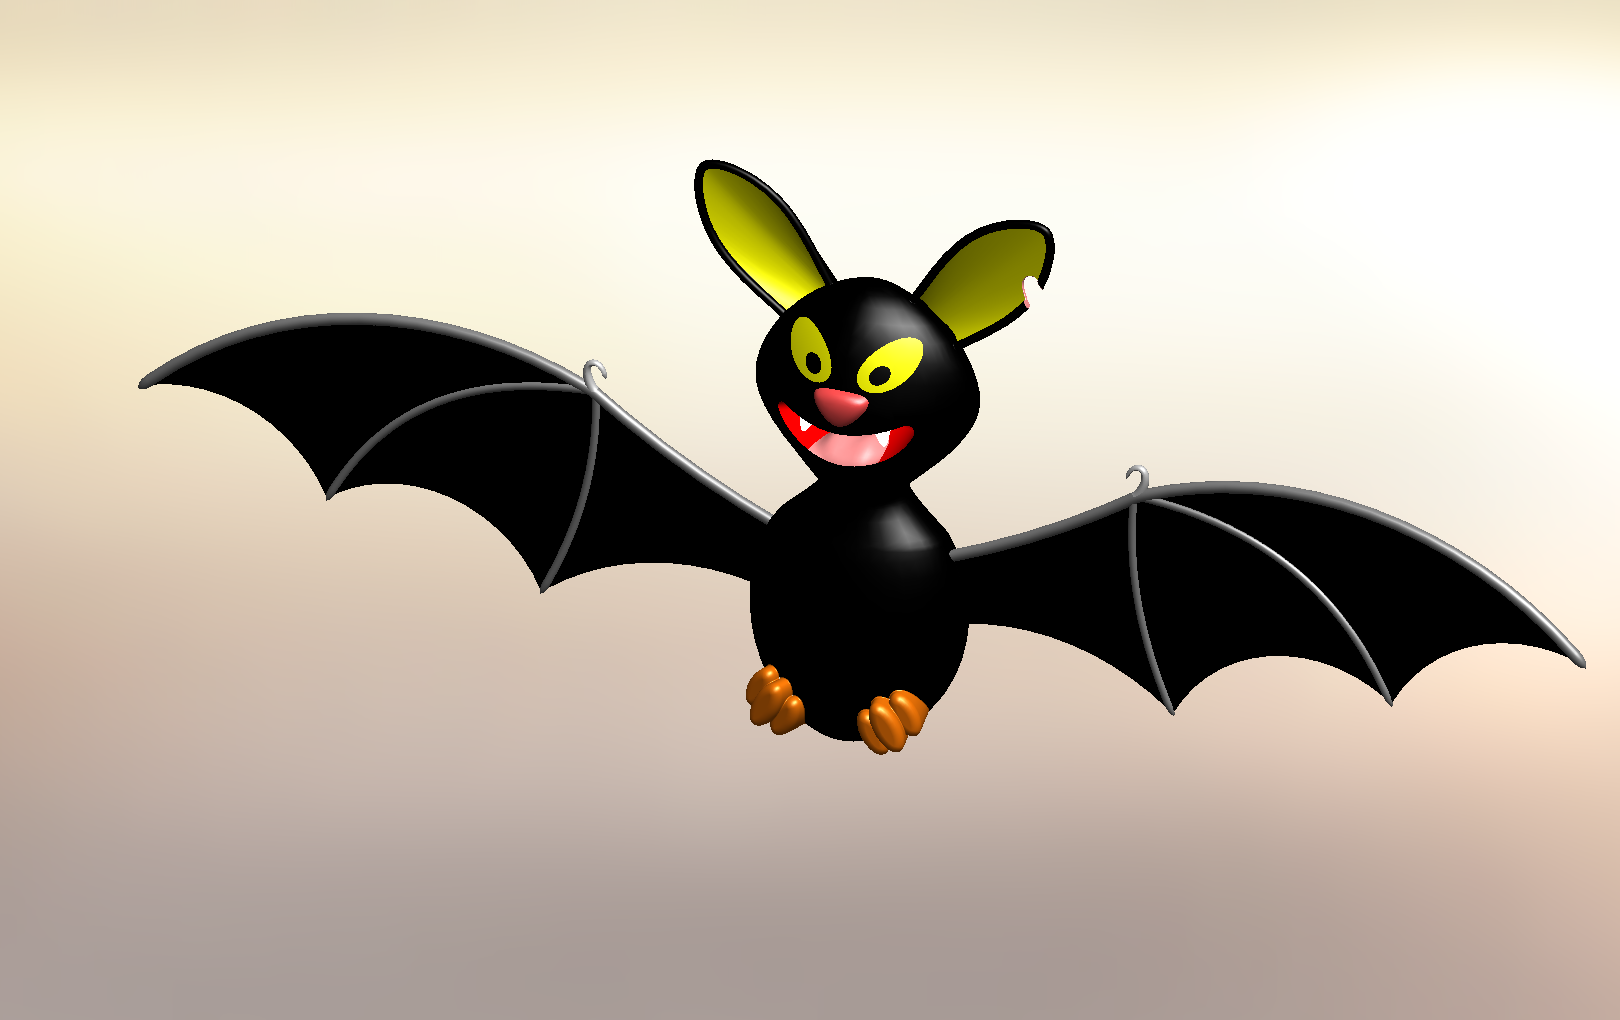 SOLIDWORKS Part Reviewer: Halloween Bat